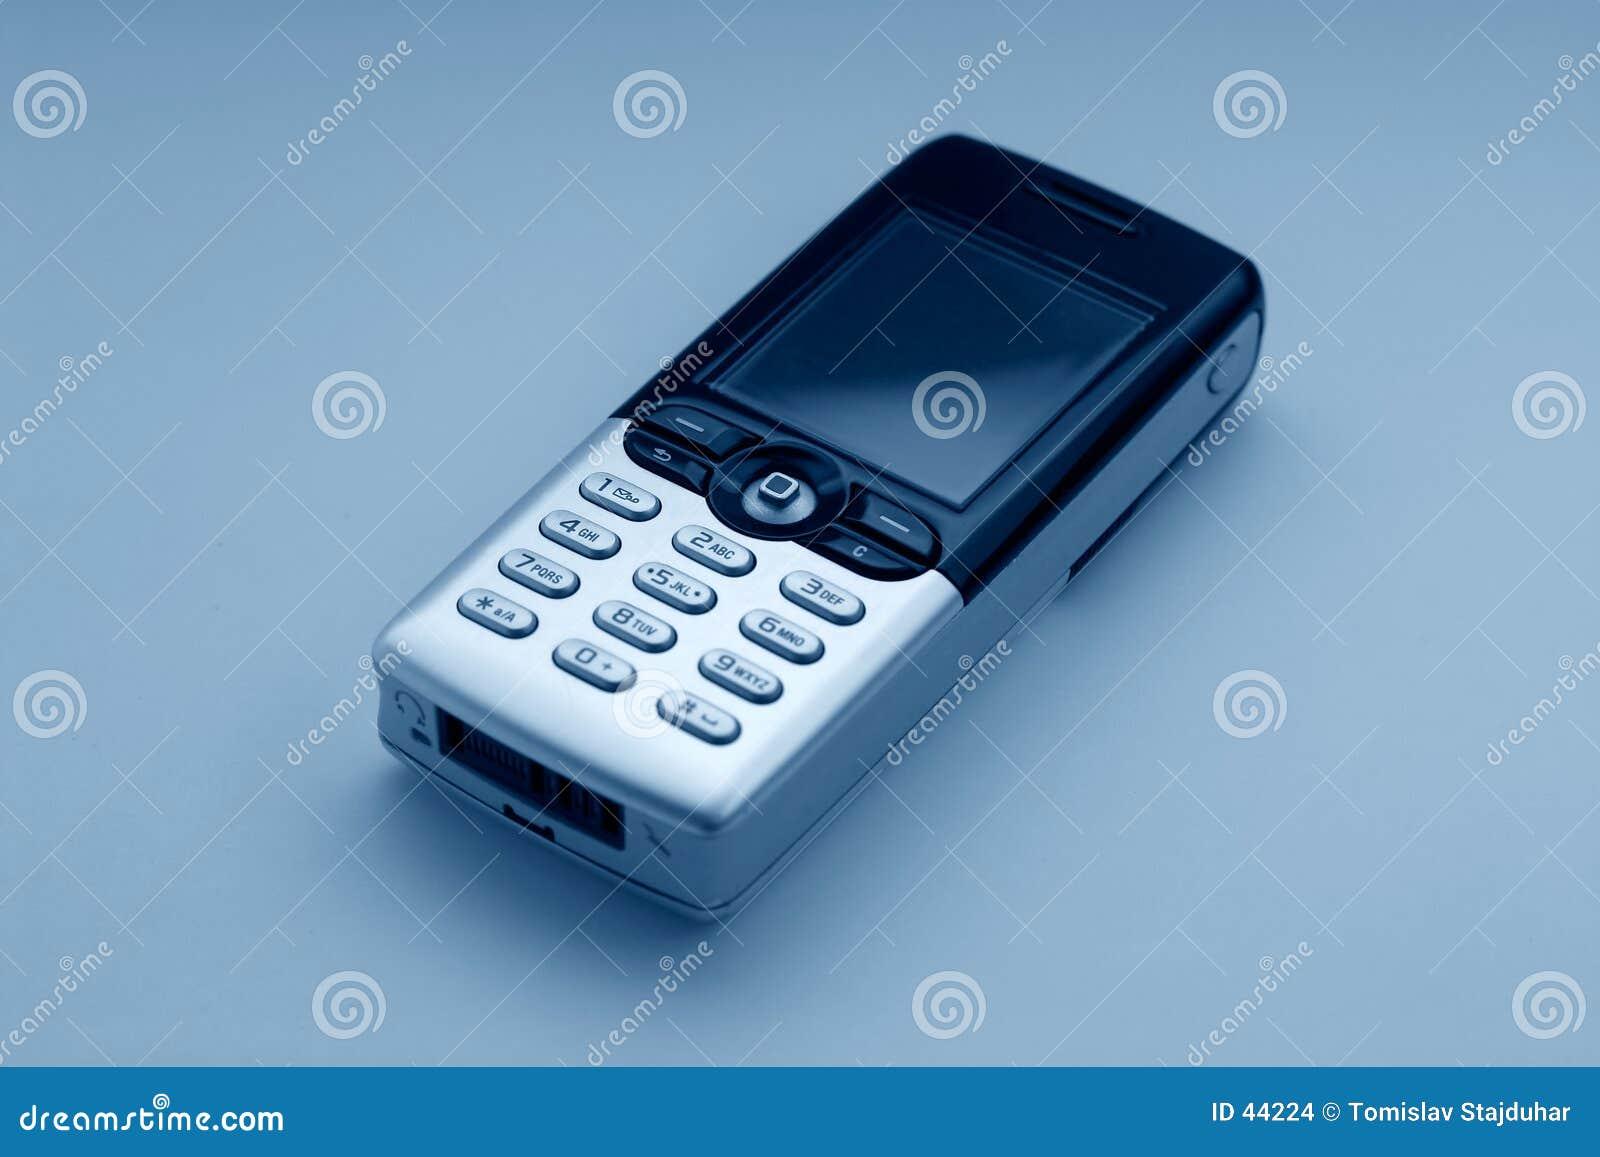 Mobile phone - blue tone